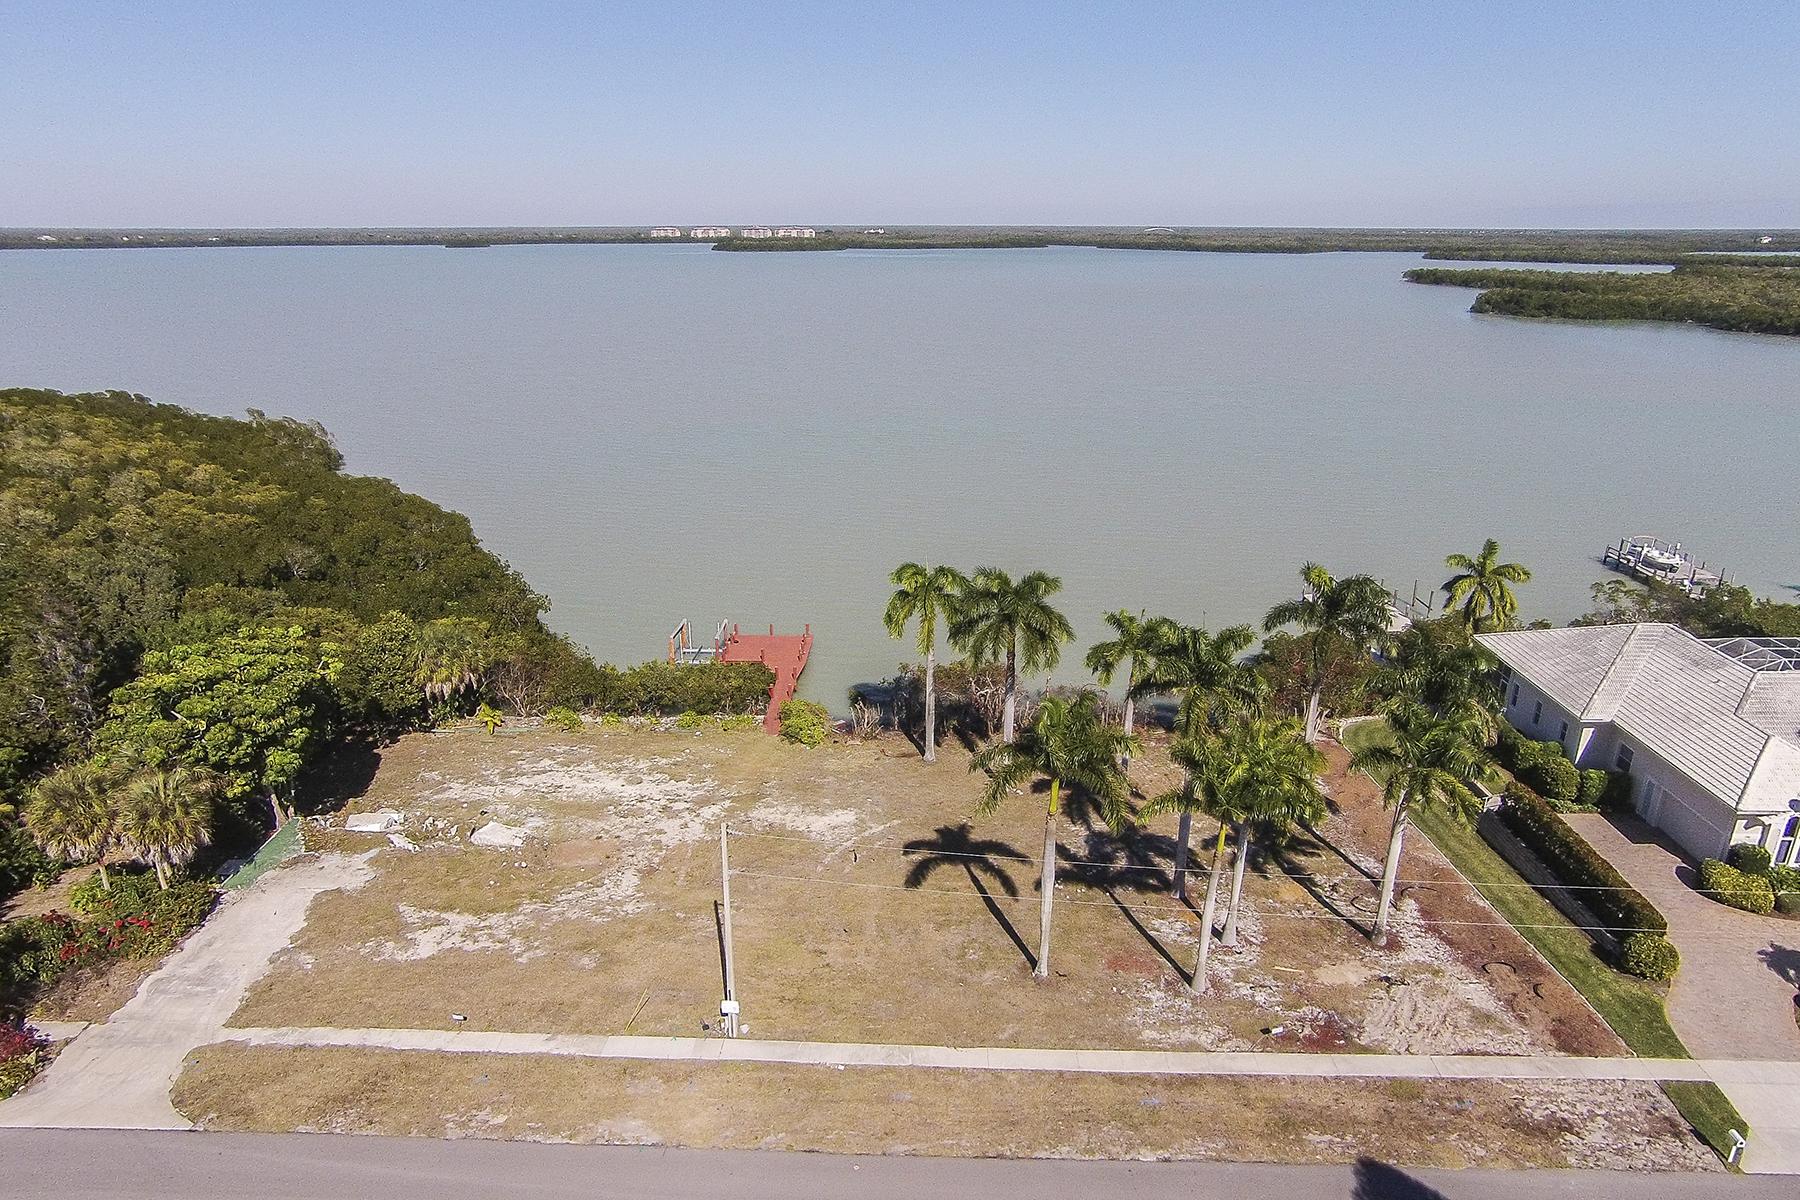 Terreno para Venda às MARCO ISLAND - CAXAMBAS DRIVE 791 Caxambas Dr Marco Island, Florida 34145 Estados Unidos